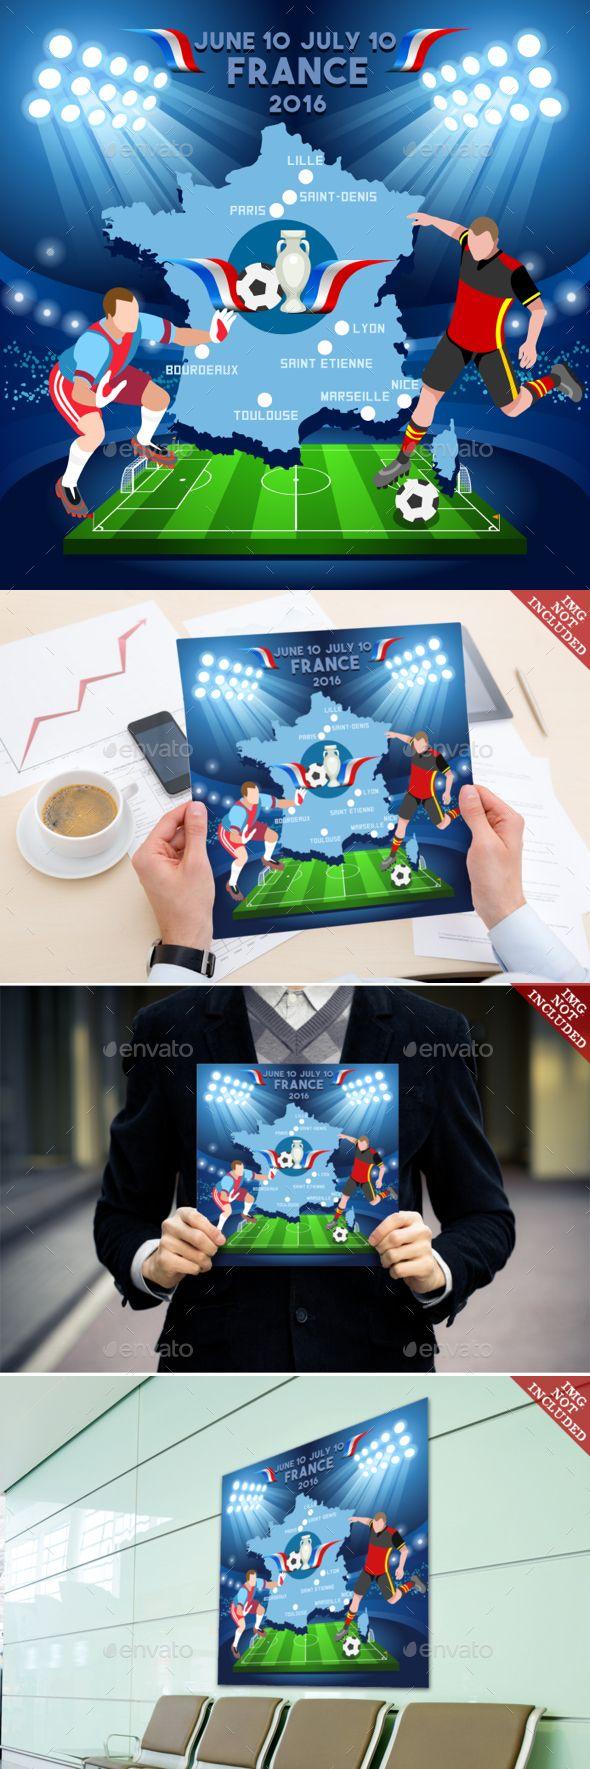 France 2016 Euro Championship